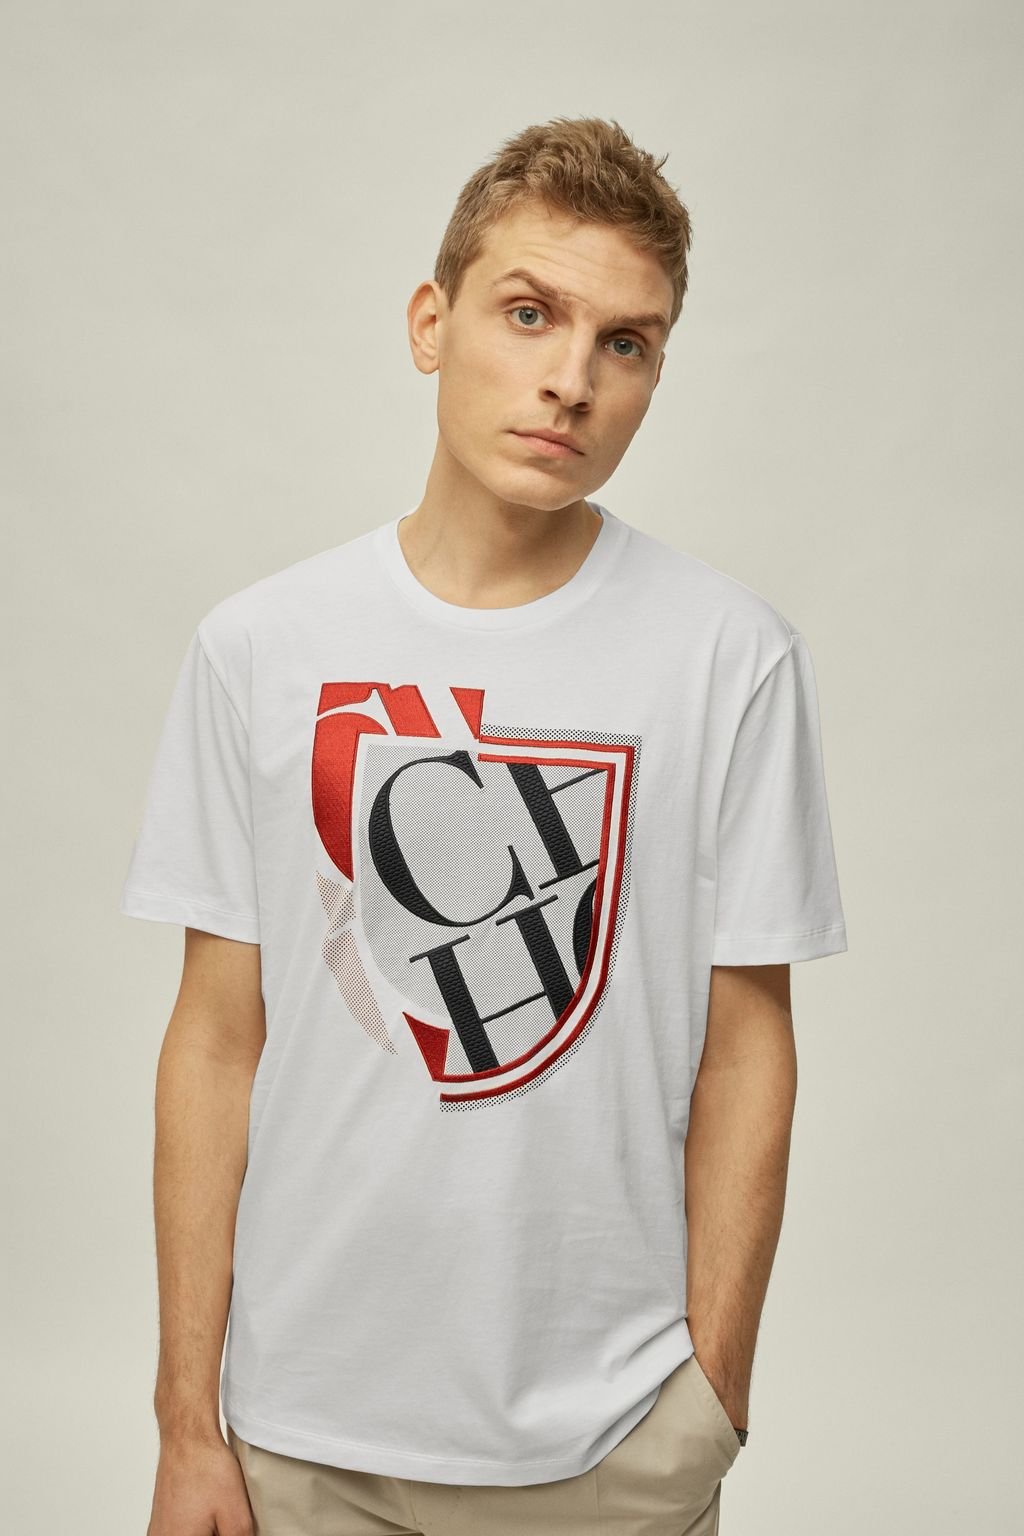 Escudo cotton t-shirt